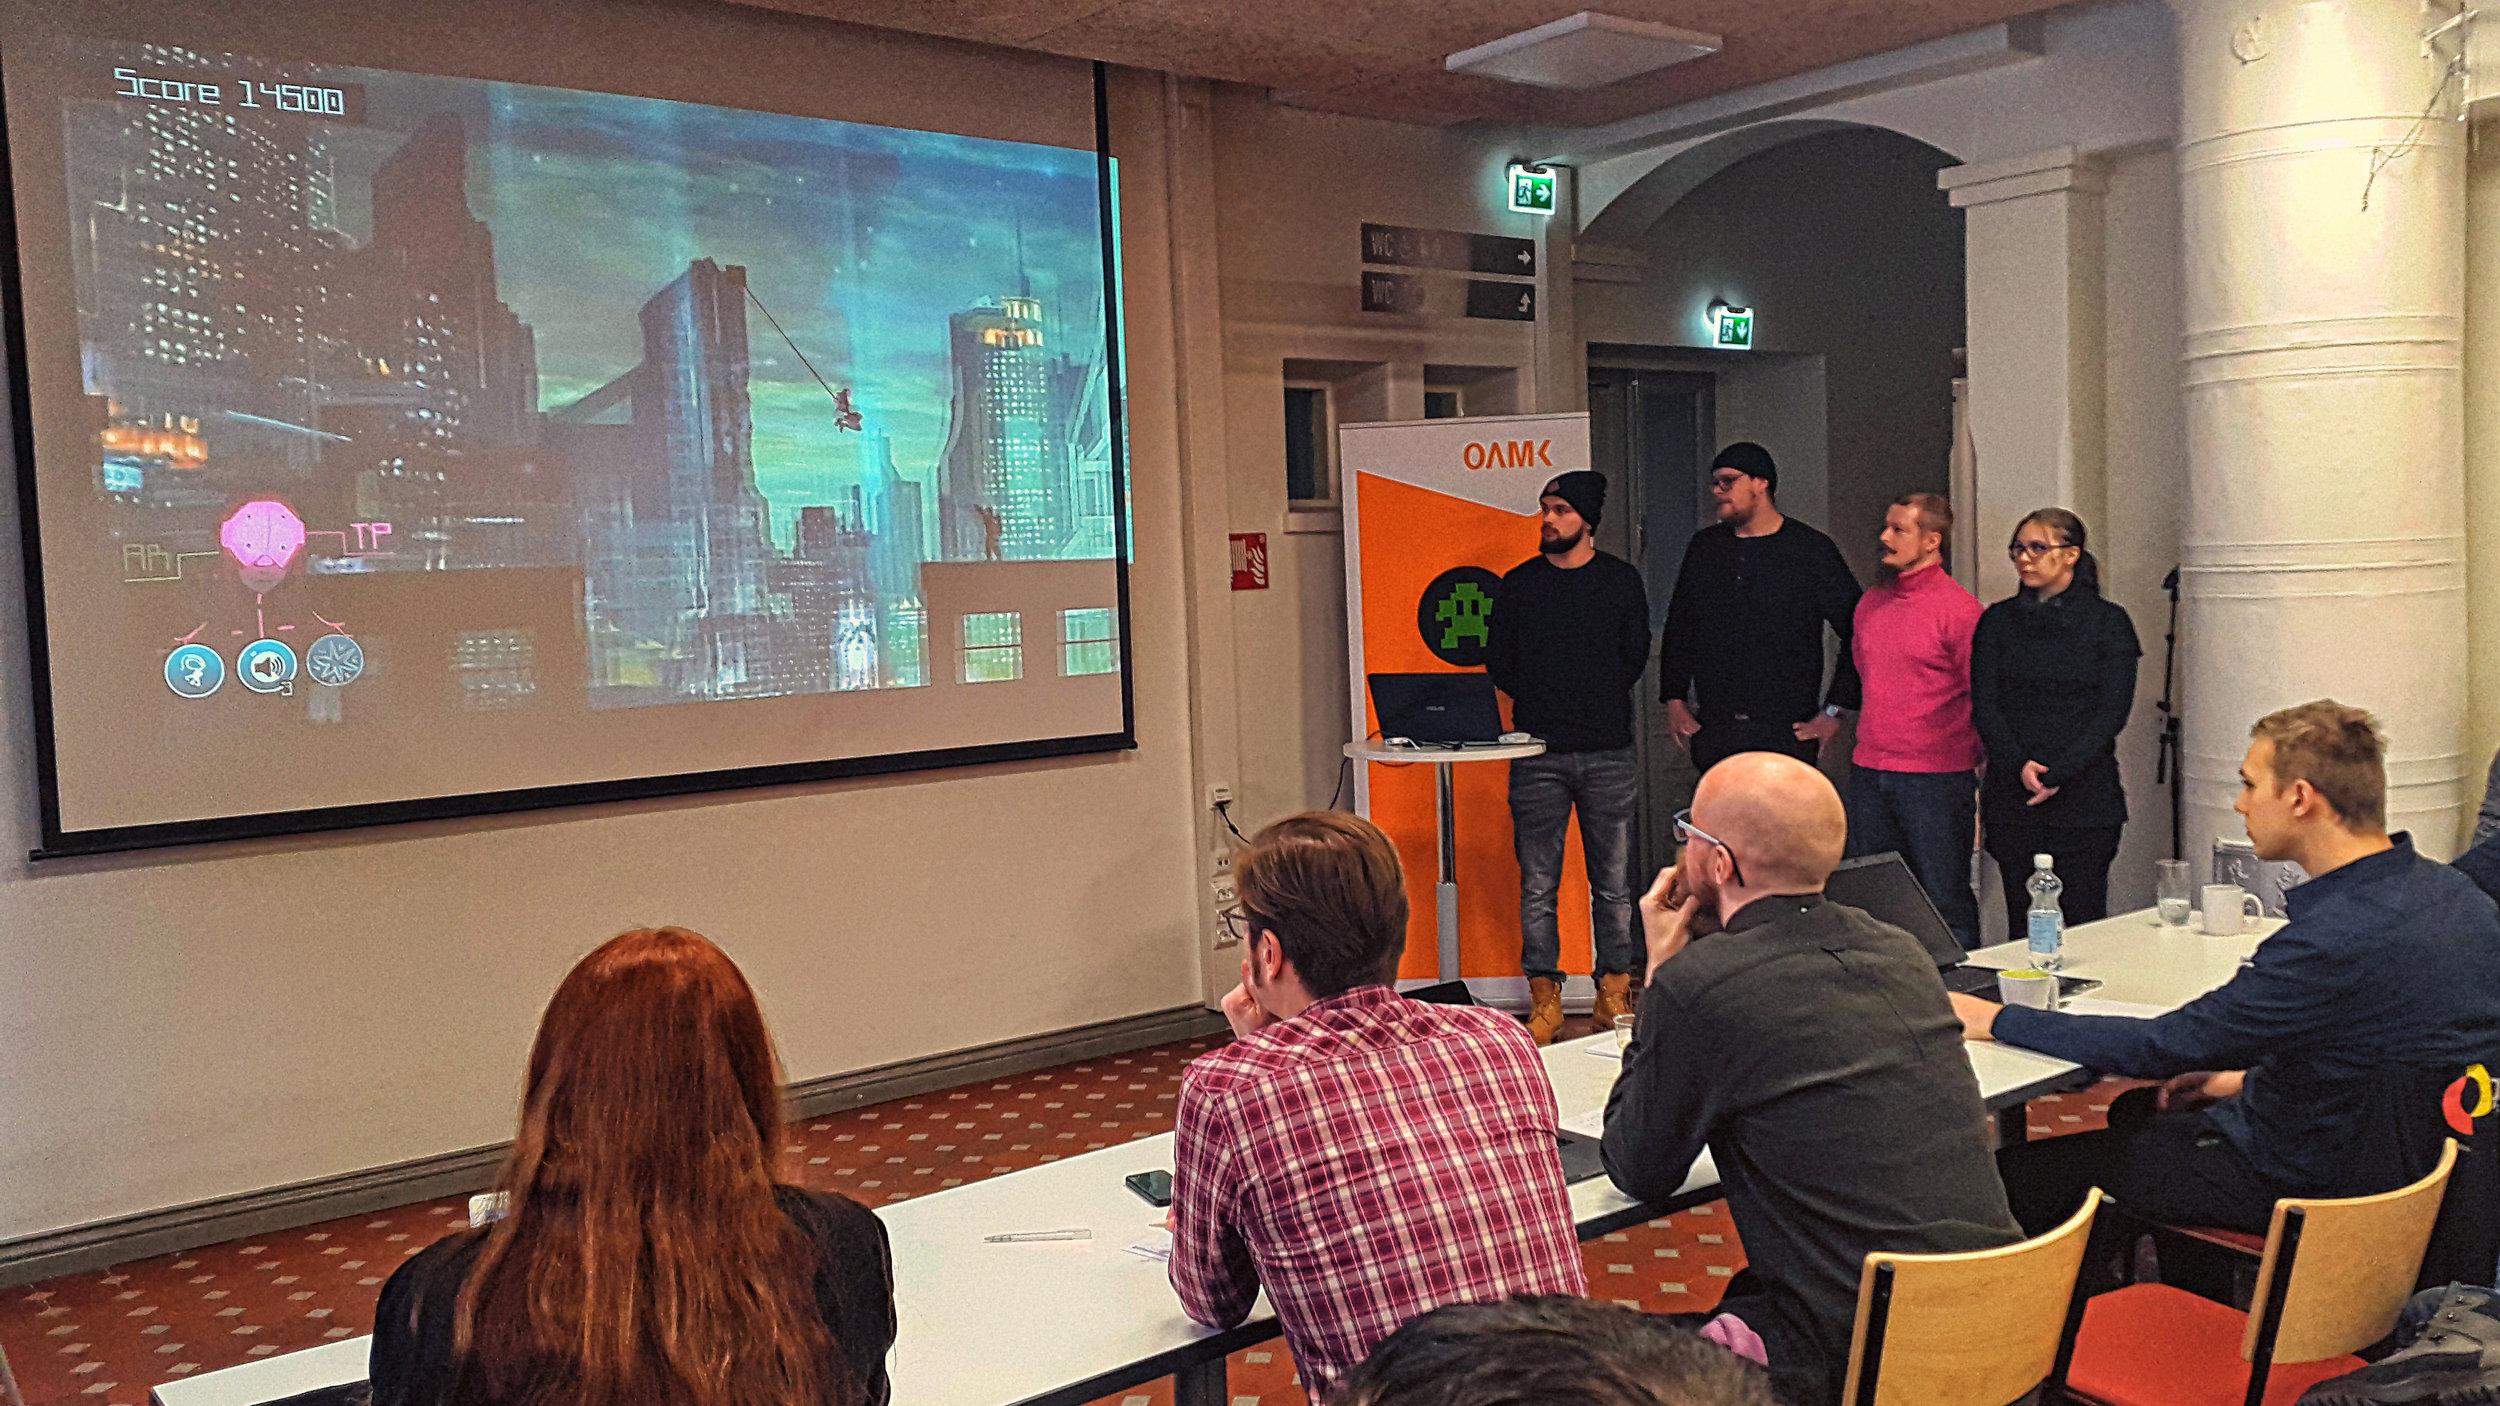 The jury members:Natasha Trygg (Snowfall Ltd. / Turku Game Hub - The Hive), Tomi Hurskainen (Playsign), Tuomas Soukka (Fingersoft), Sasu Louke (Expa Game Business Co-Operative),Juho Wallen (Meizi Games),